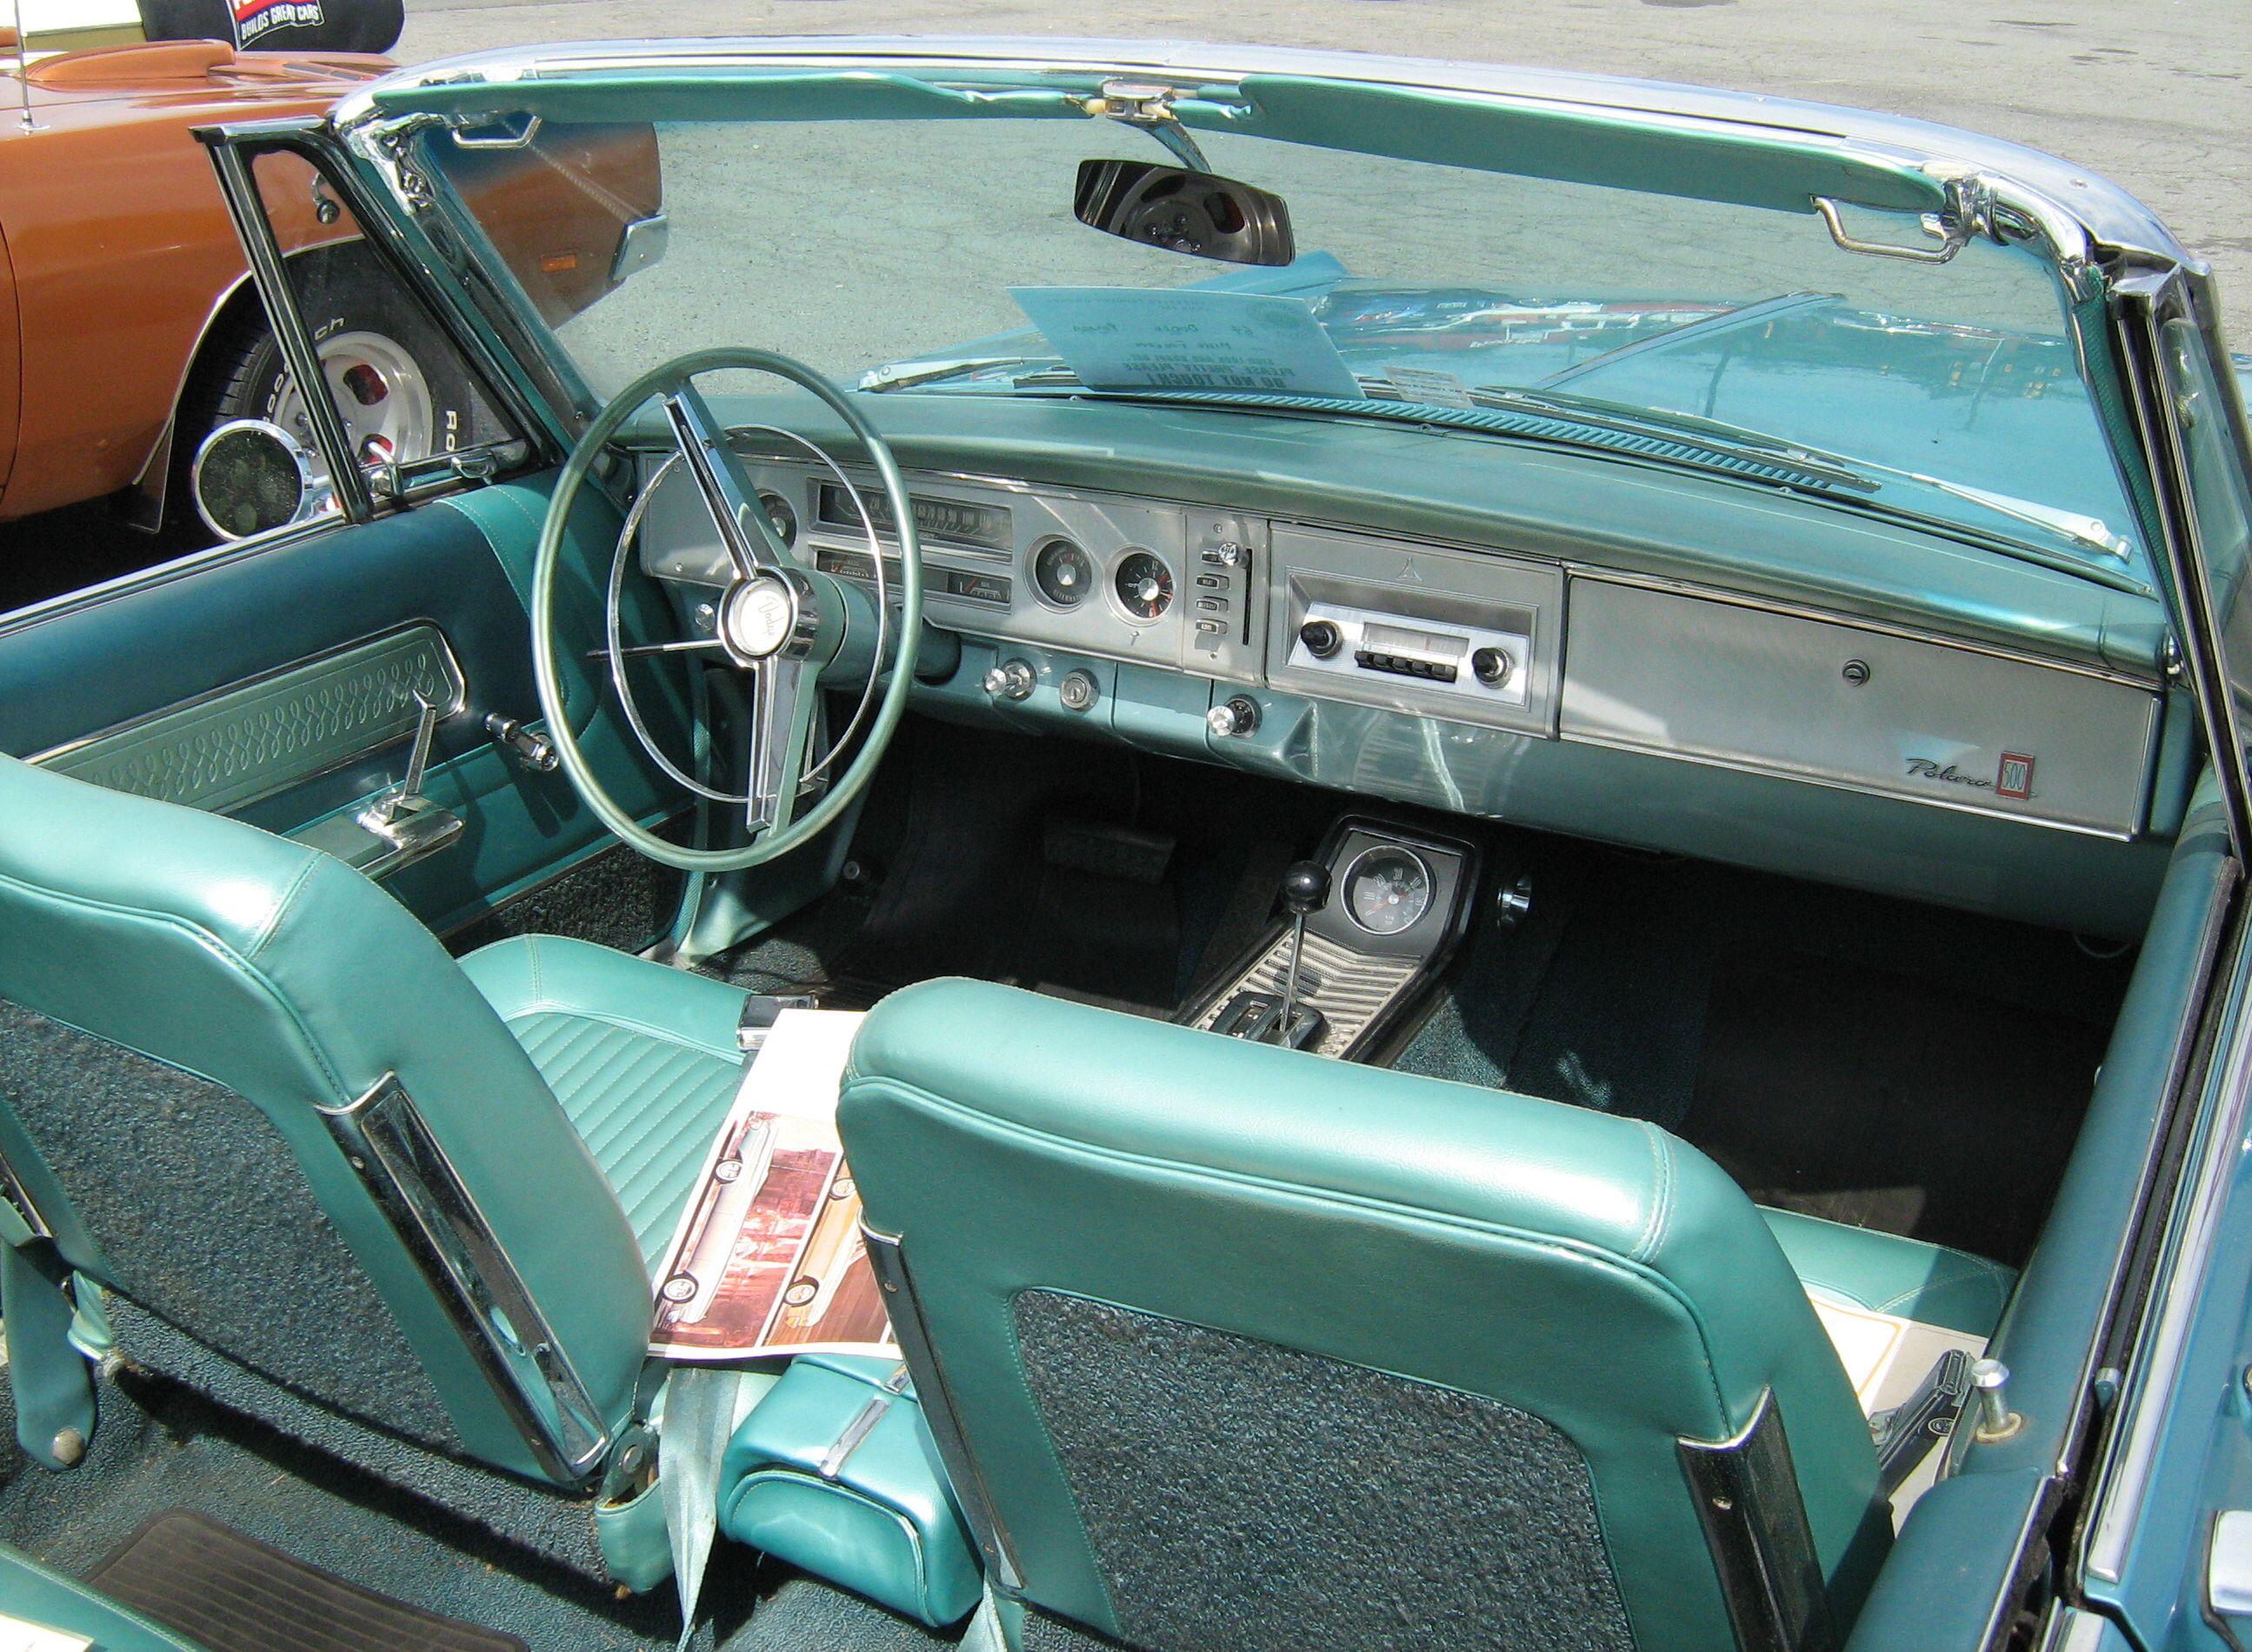 1964 dodge polara 500 conv interior dodge polara wikipedia the free encyclopedia